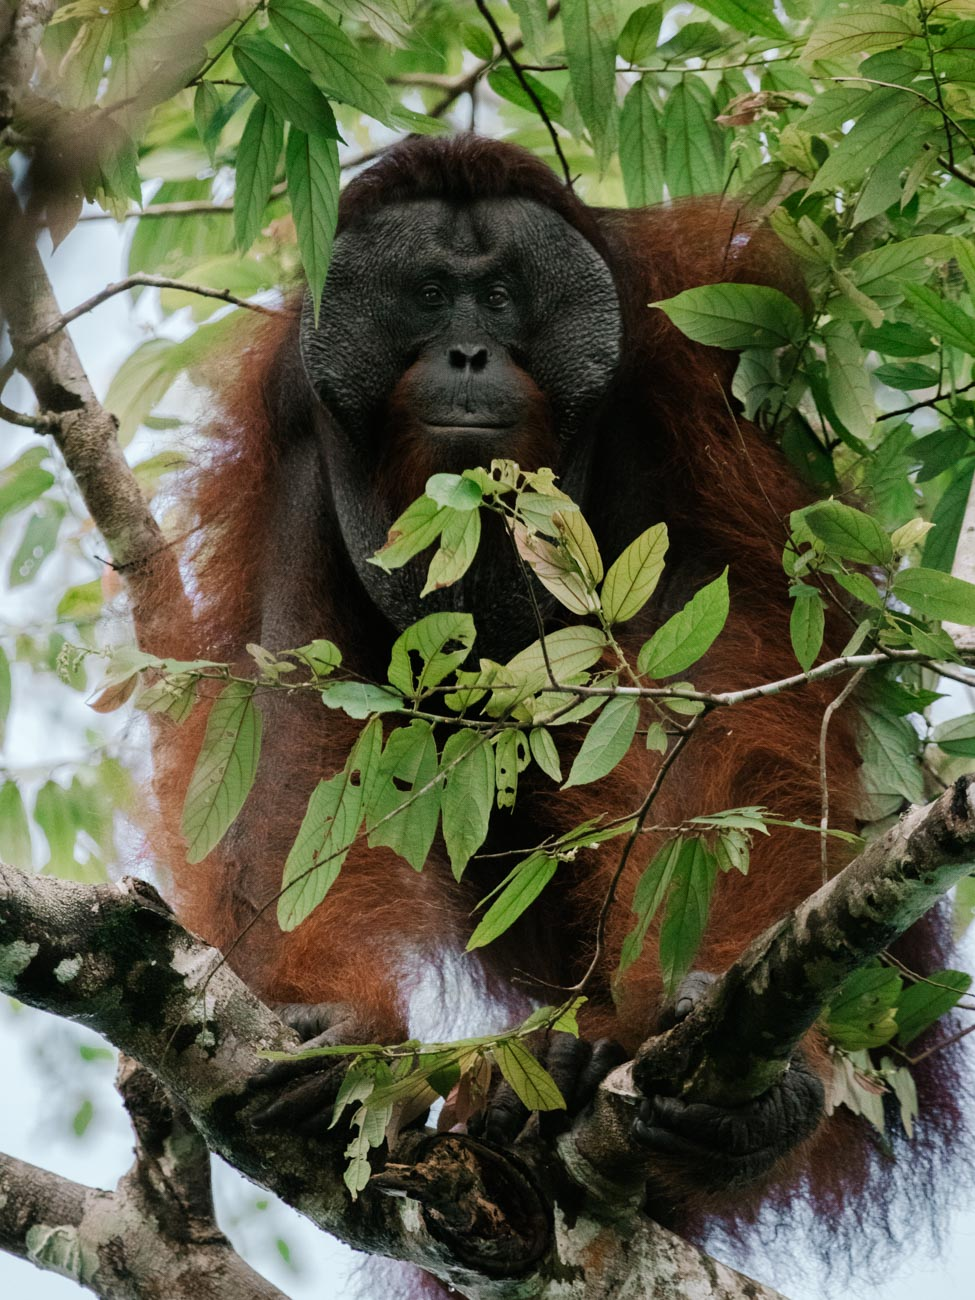 Male Orangutan, Kinabatangan River, Borneo